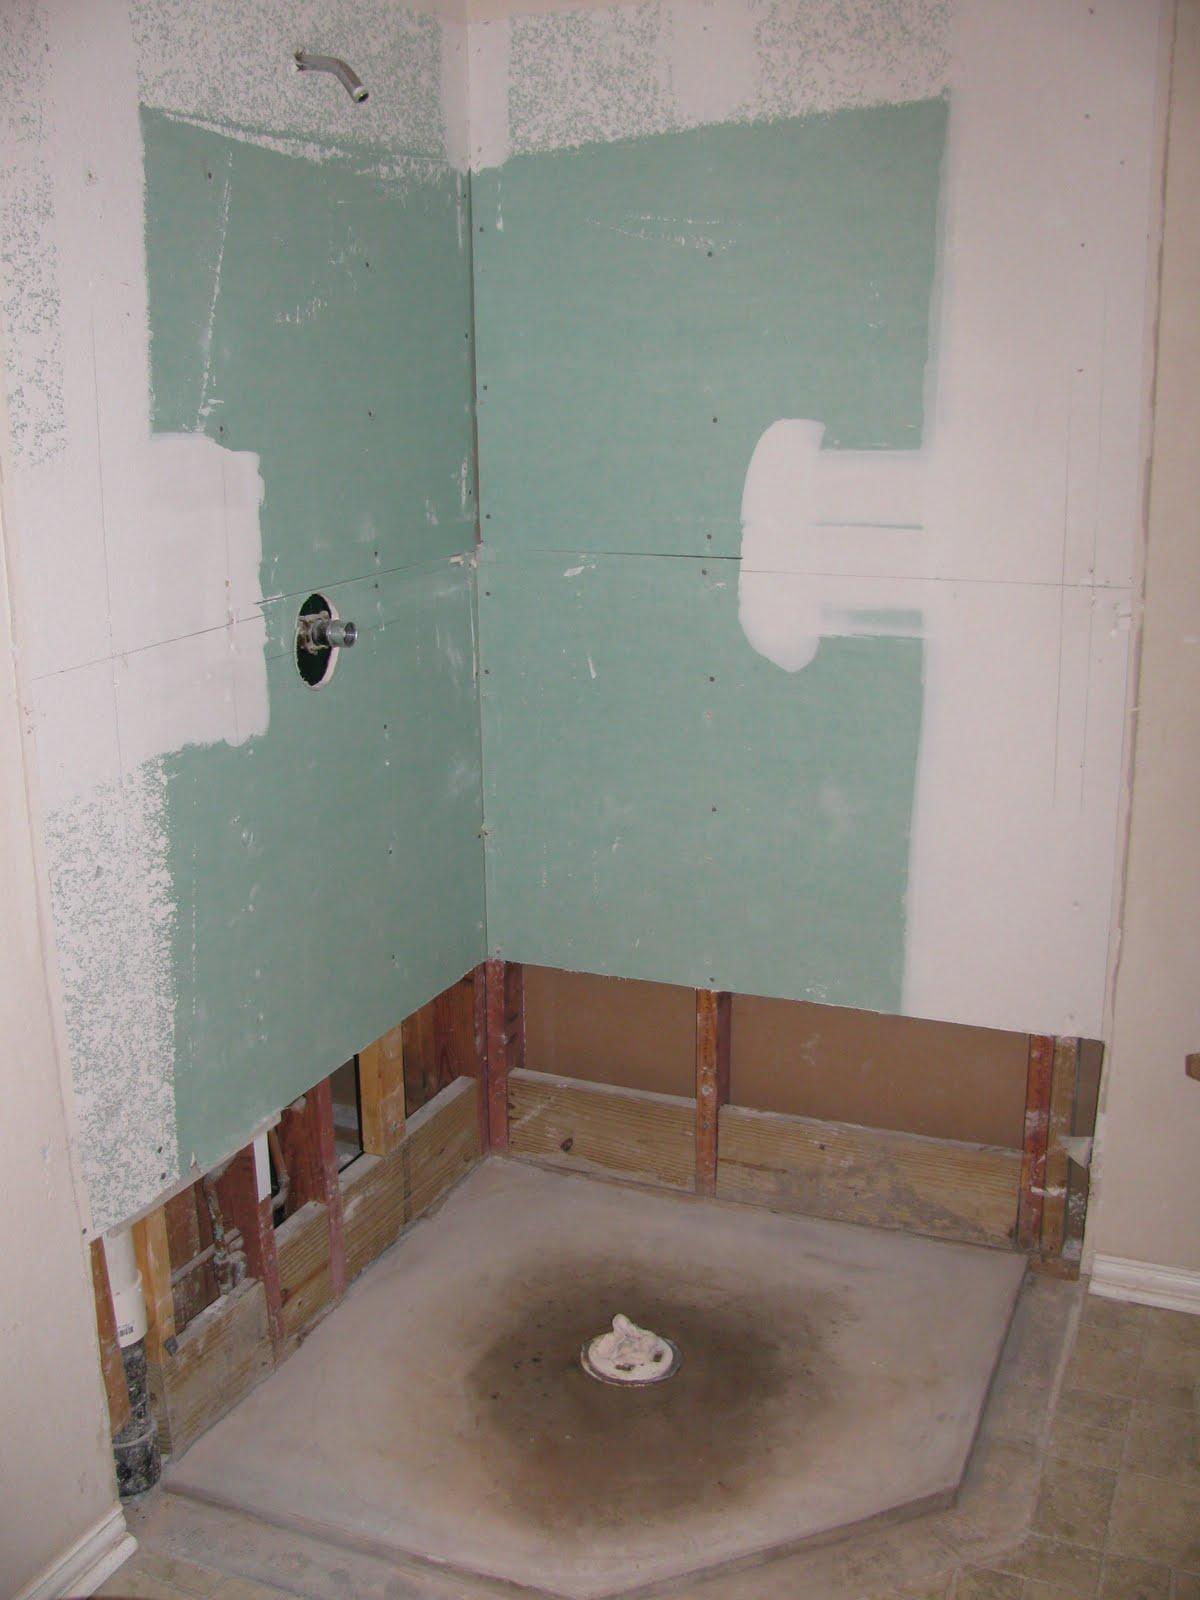 http://3.bp.blogspot.com/_3TIF5mZ6GH8/SxIbd-3PACI/AAAAAAAAACI/ZzlmNYUZPOM/s1600/Gun,+Bathroom,+Thanksgiving+2009+033.JPG